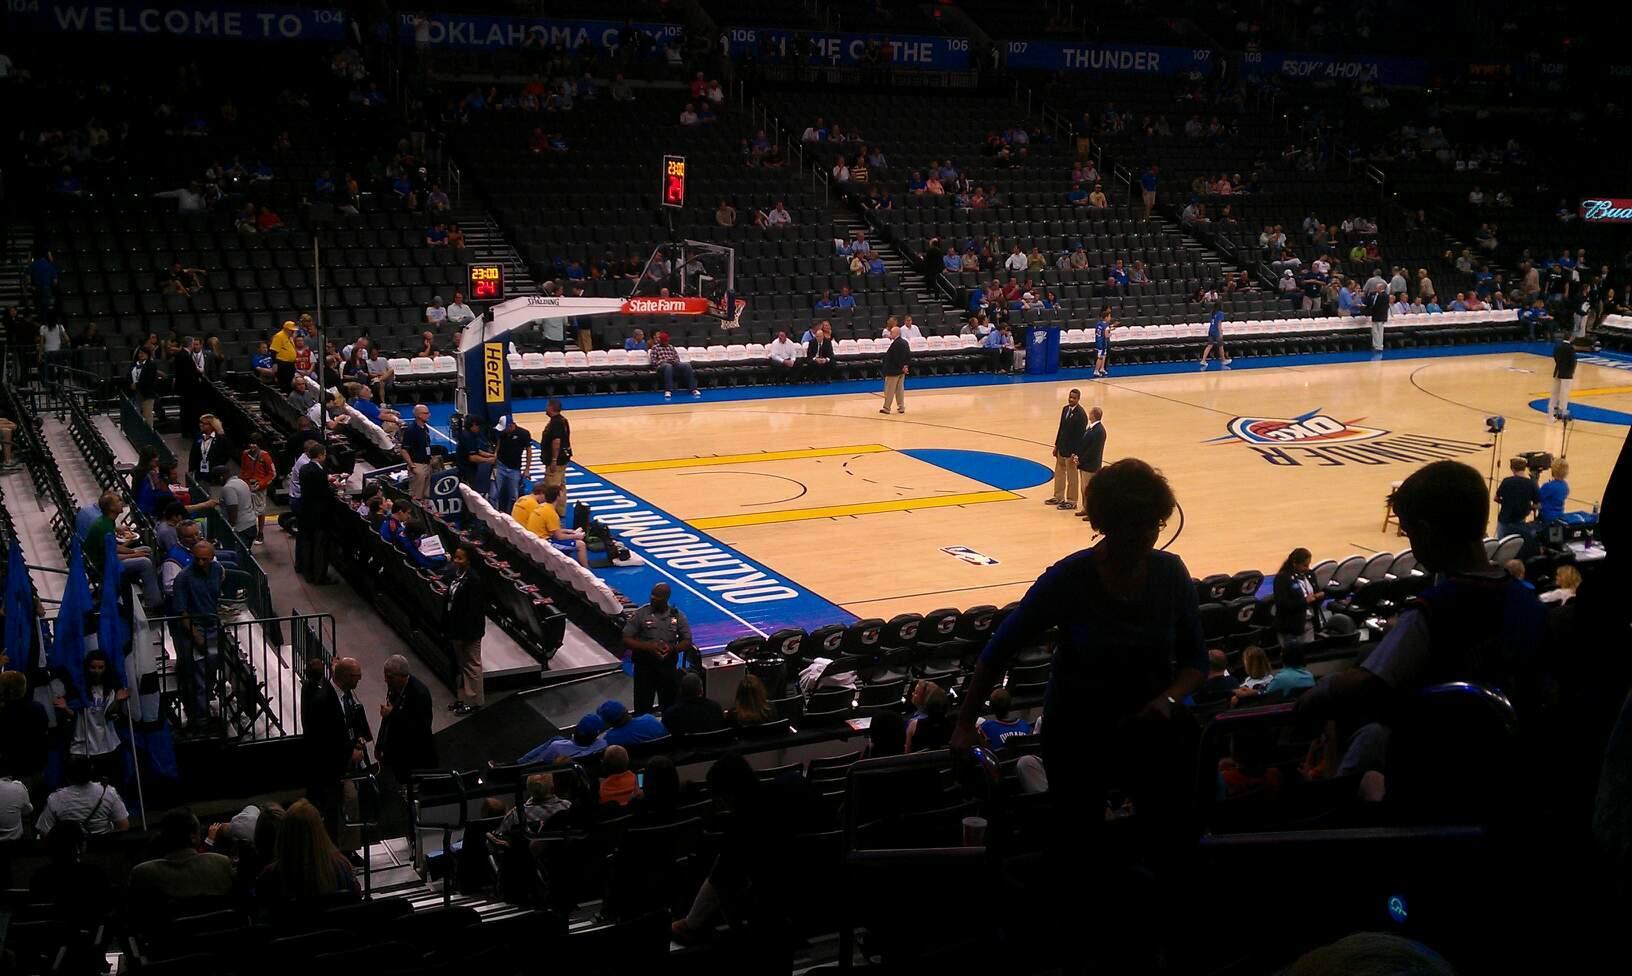 Chesapeake Energy Arena Section 118 Row Q Seat 4